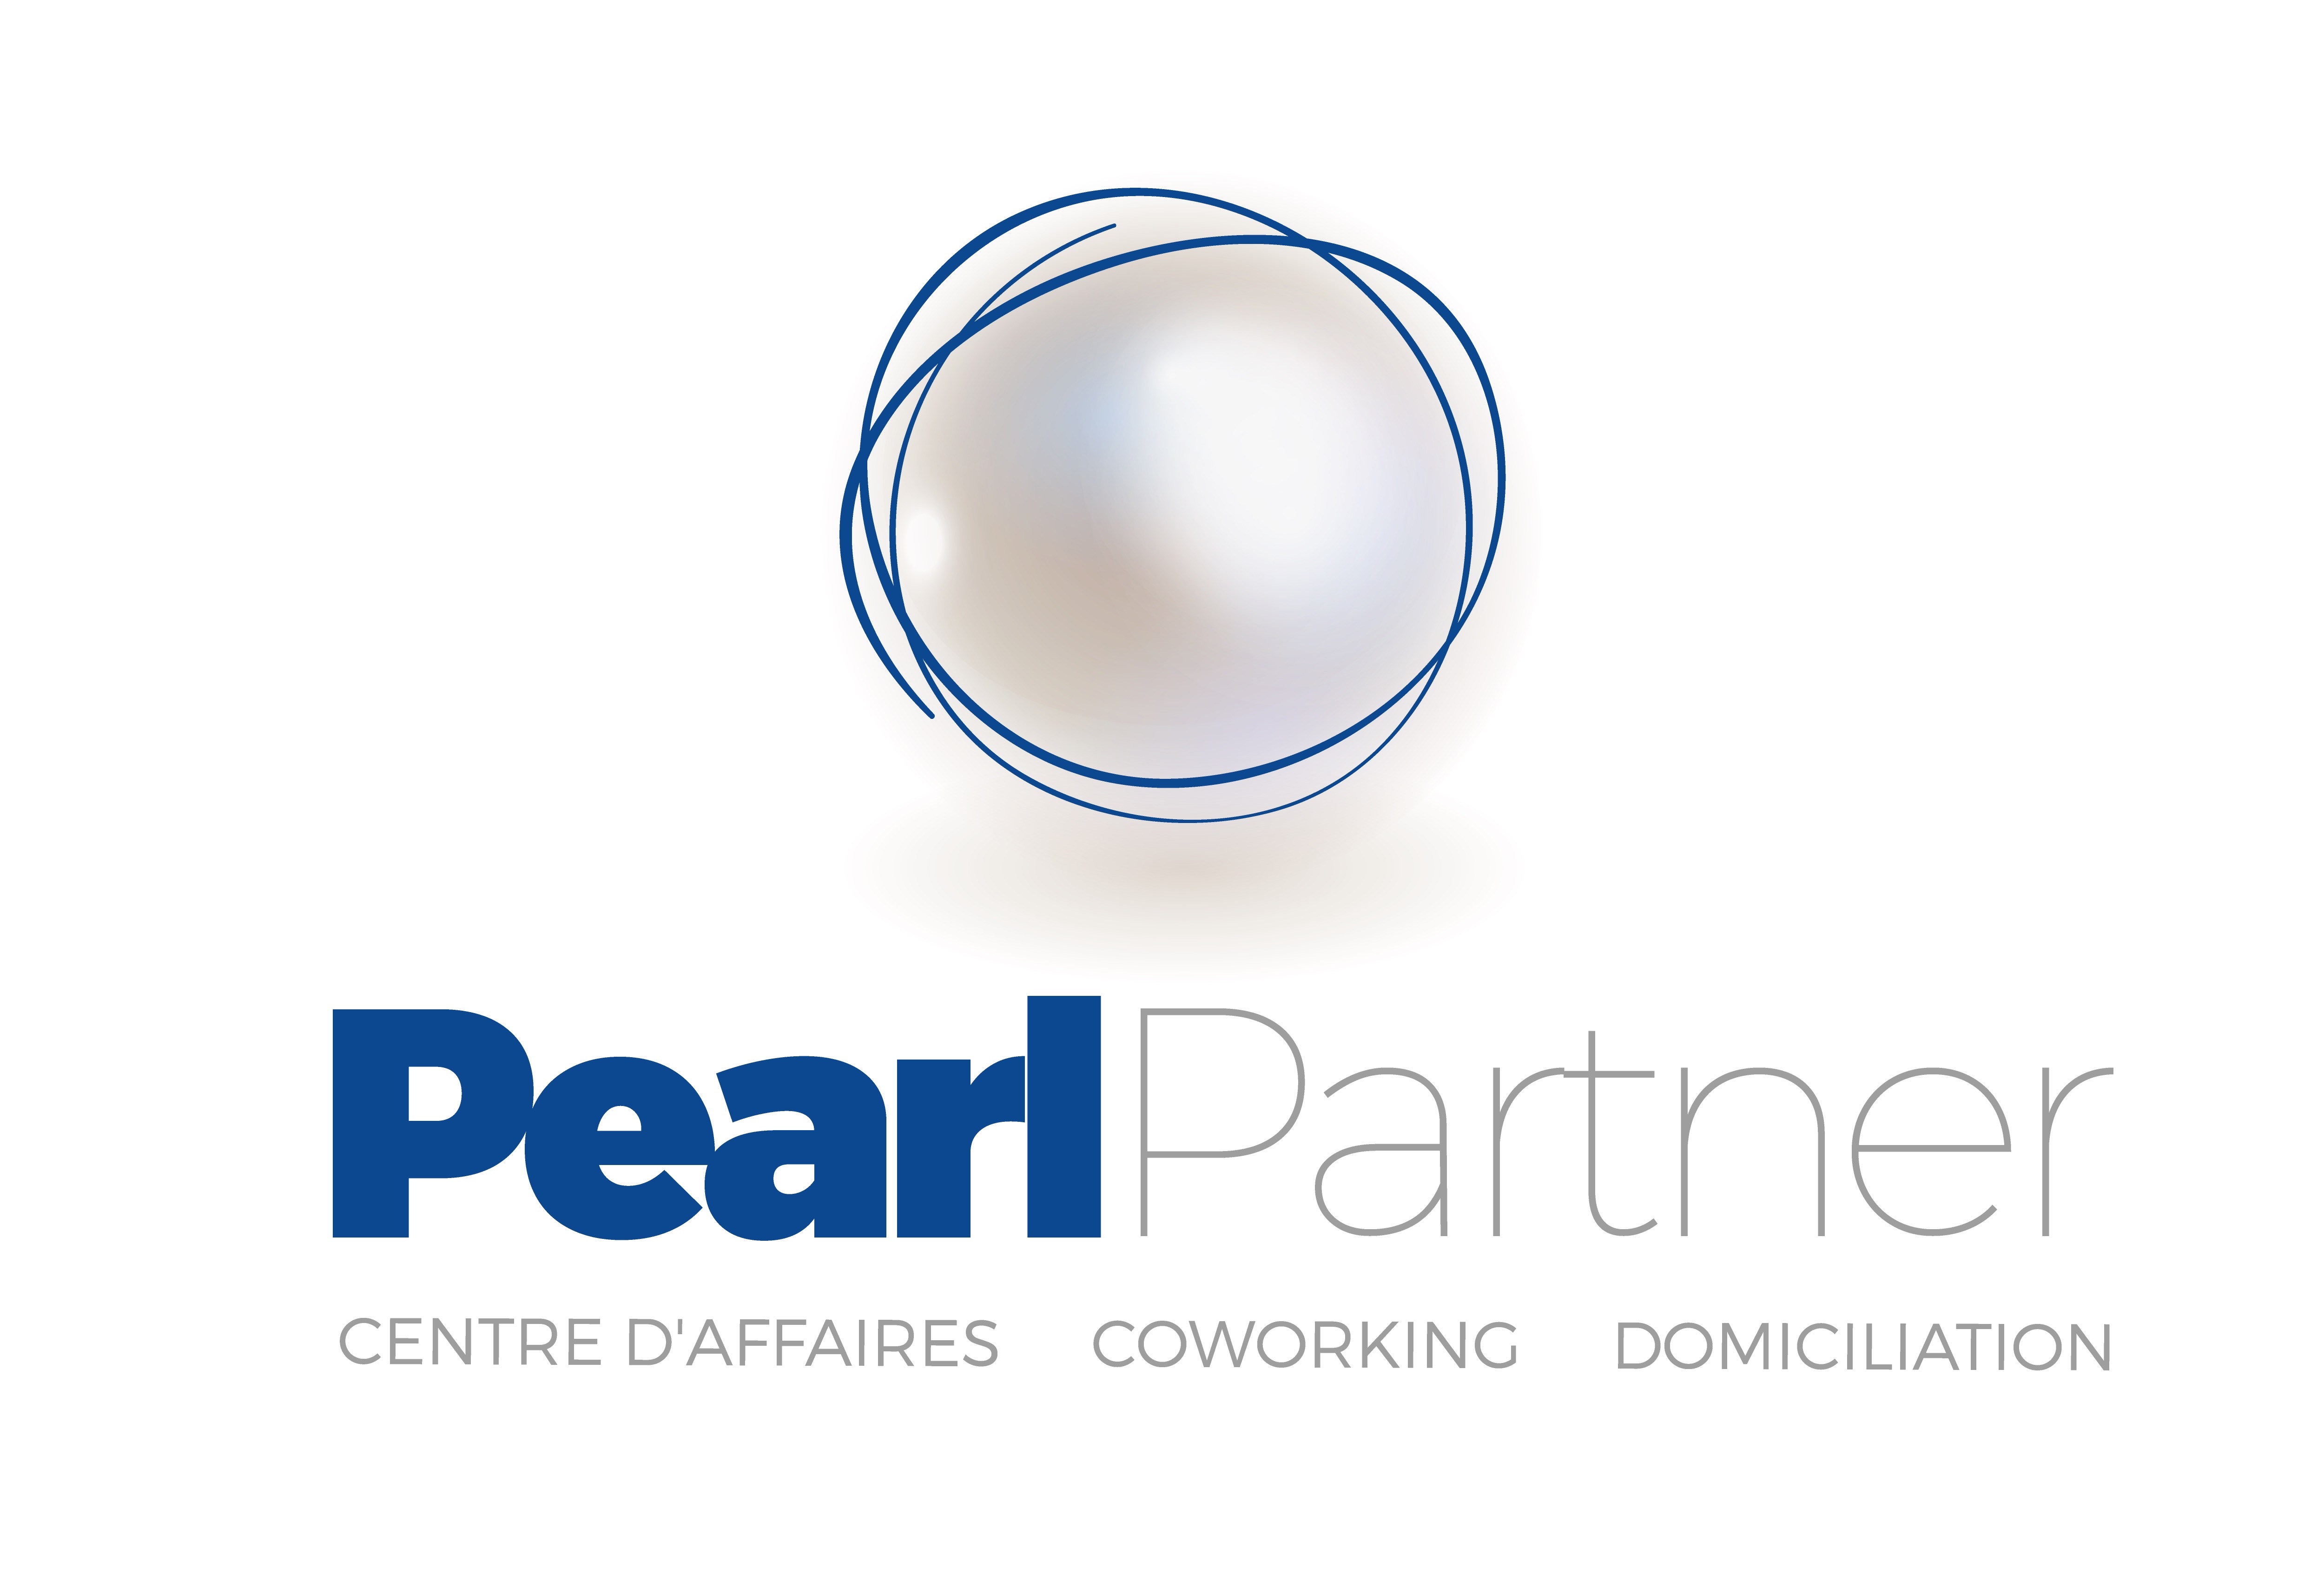 Pearl Partner